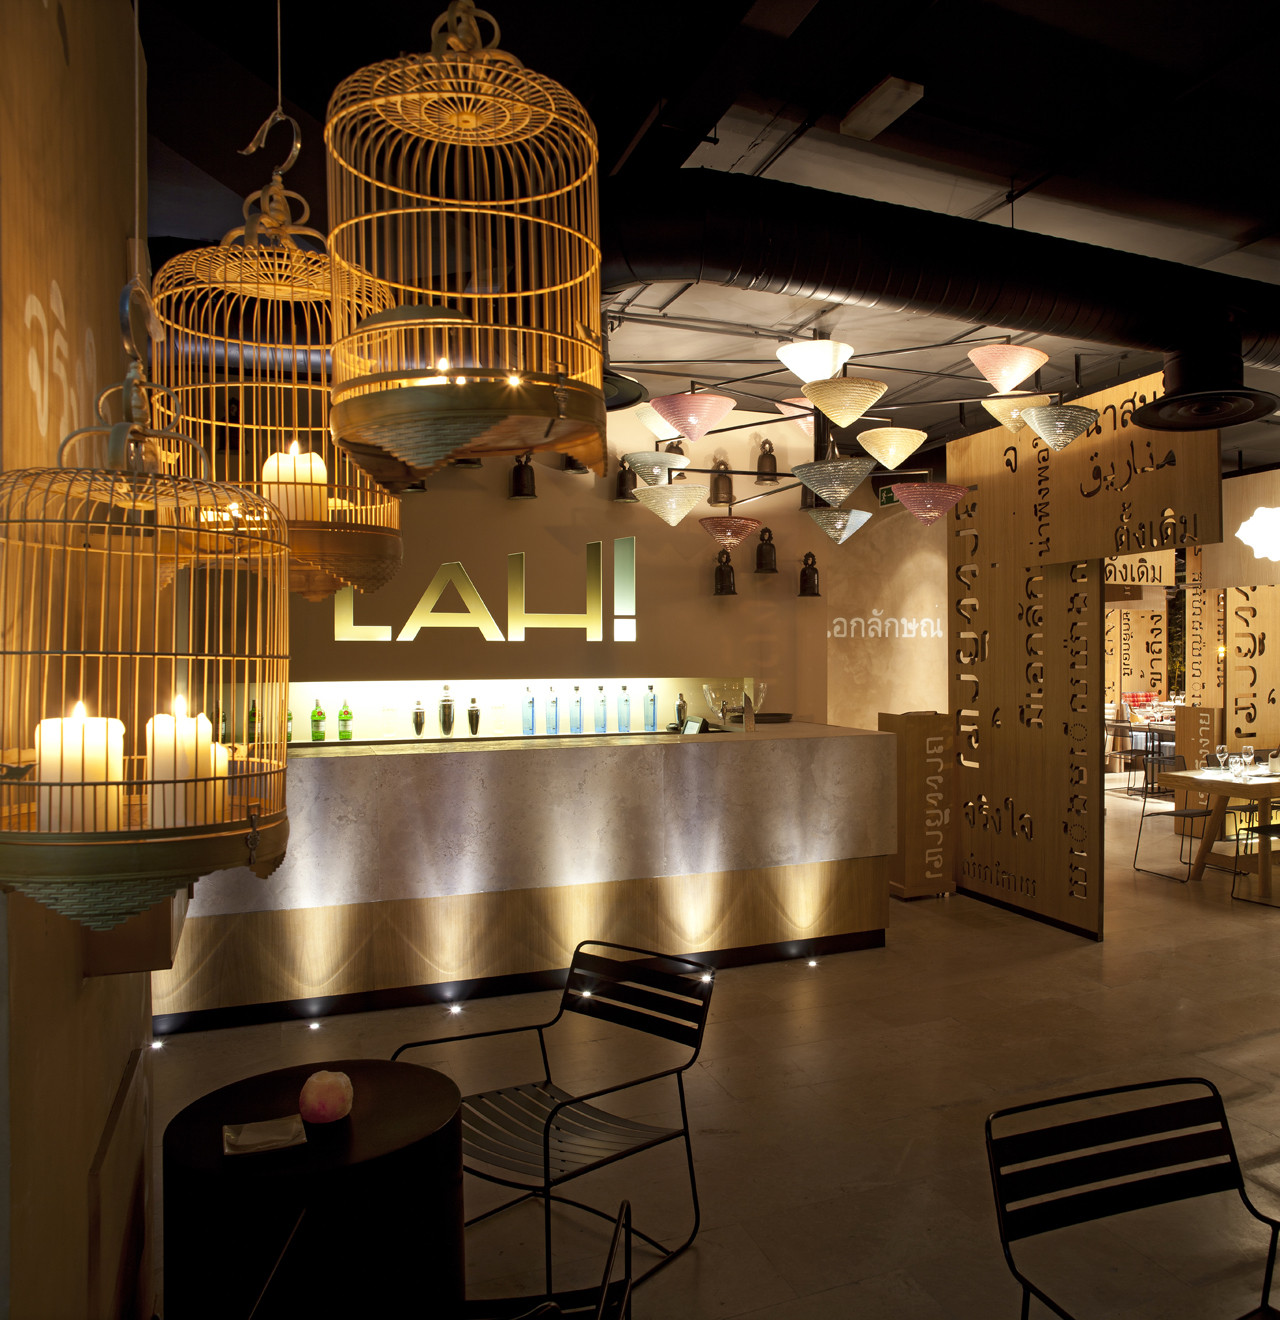 Restaurante Lah! / IlmioDesign, © Usio Davila